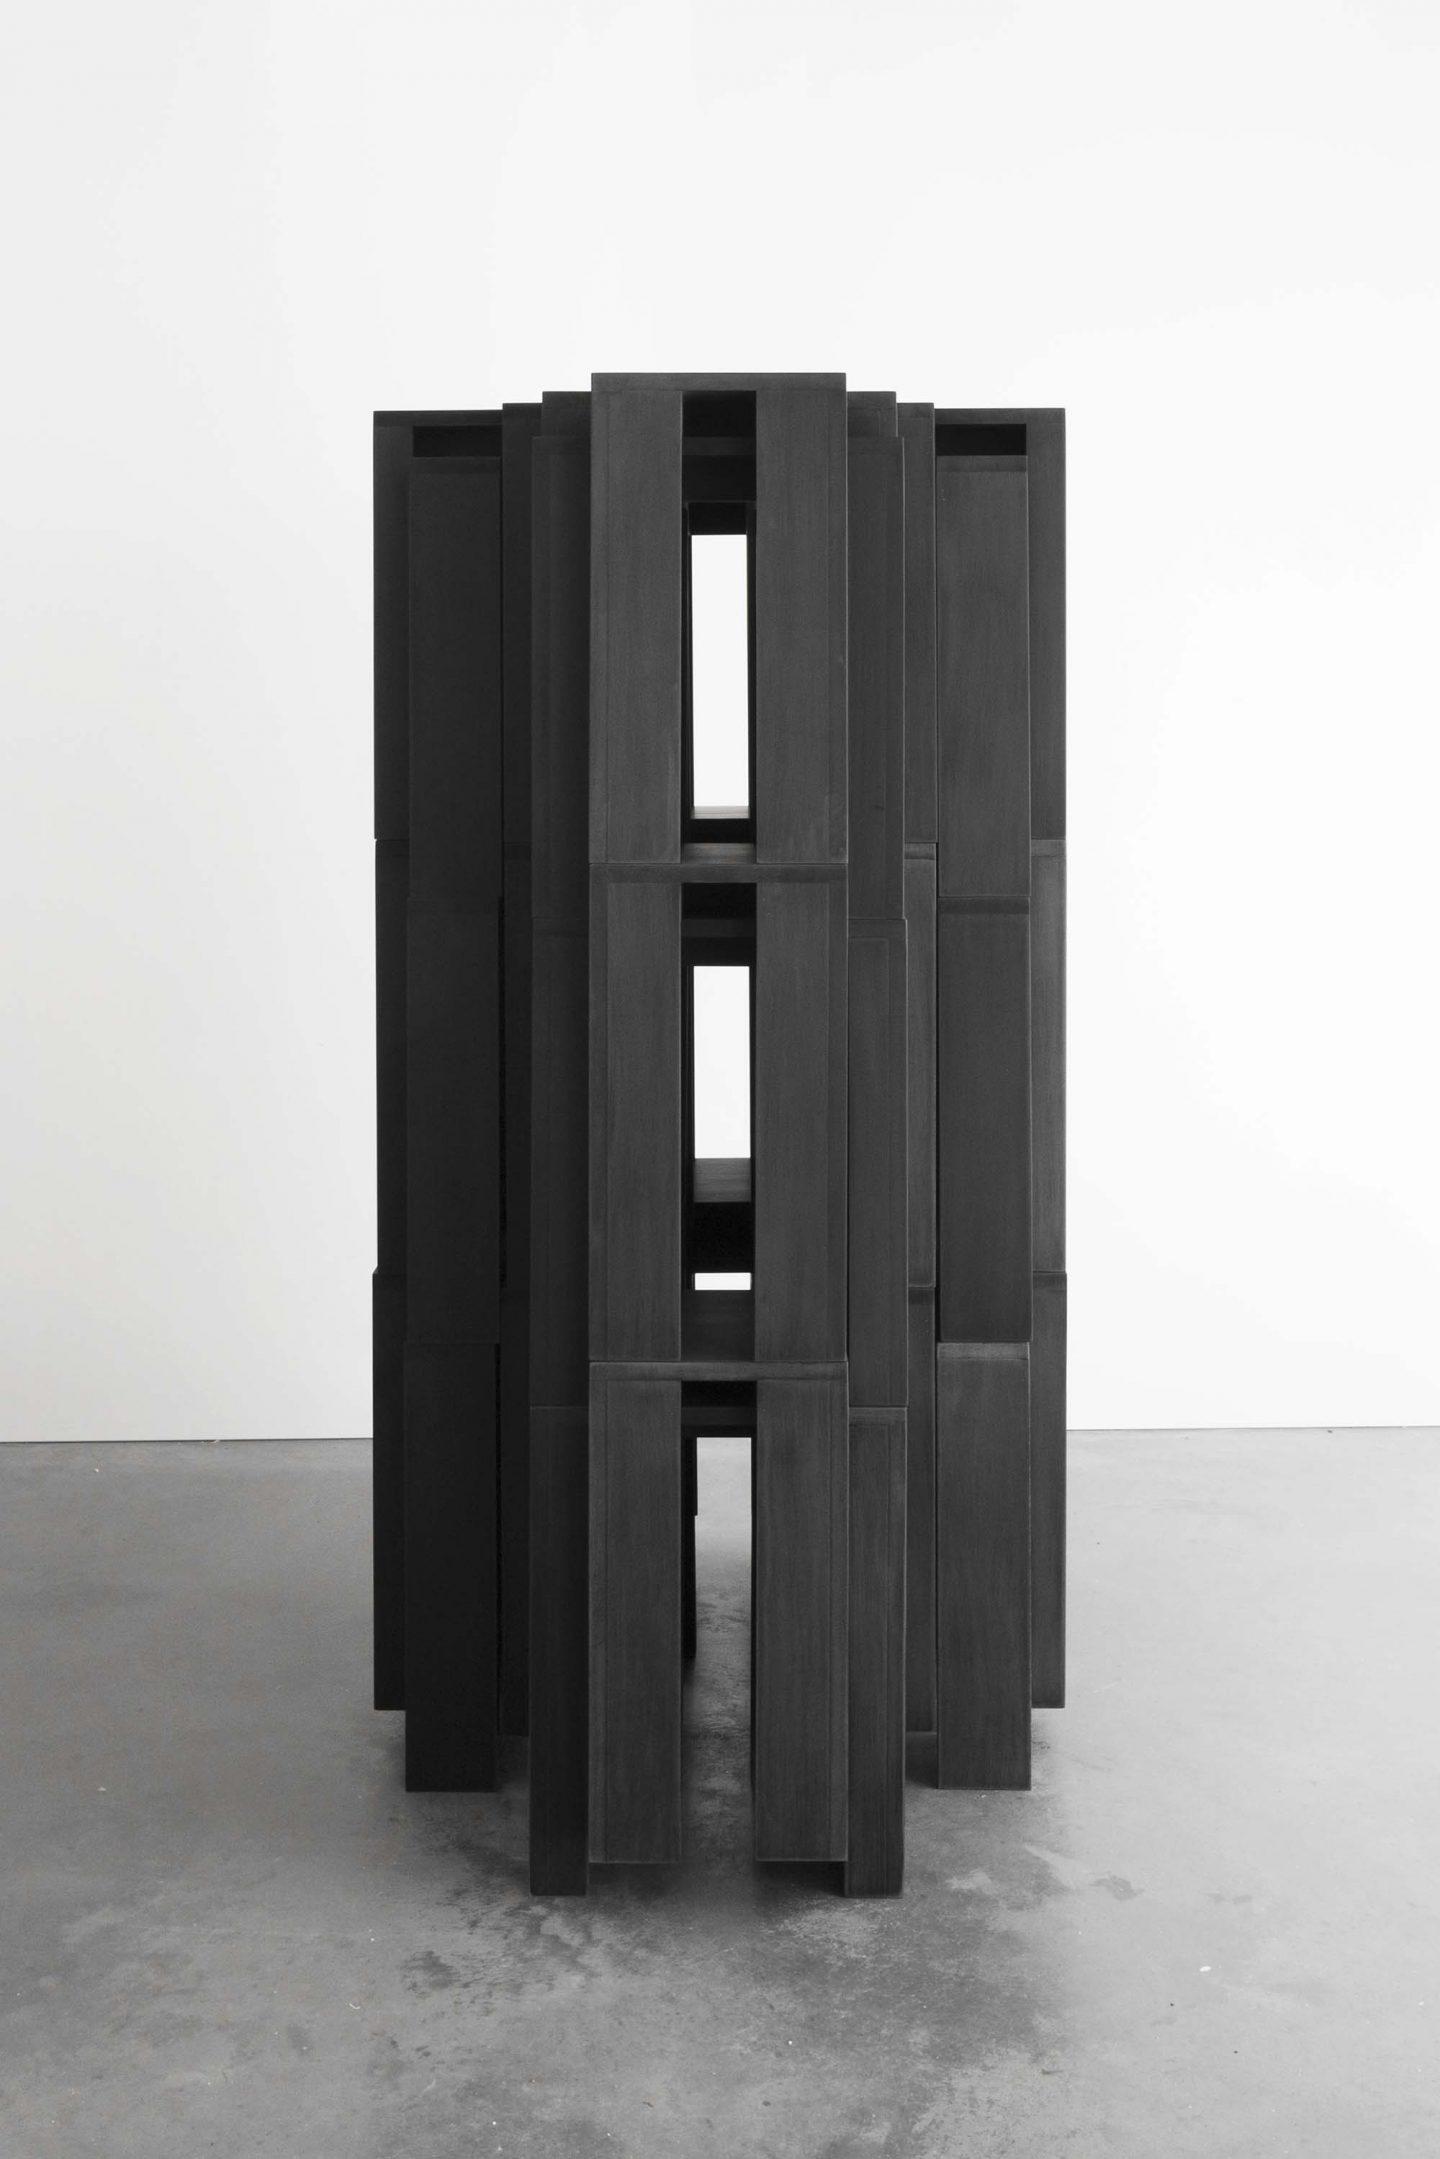 IGNANT-Design-Bram-Vanderbeke-30